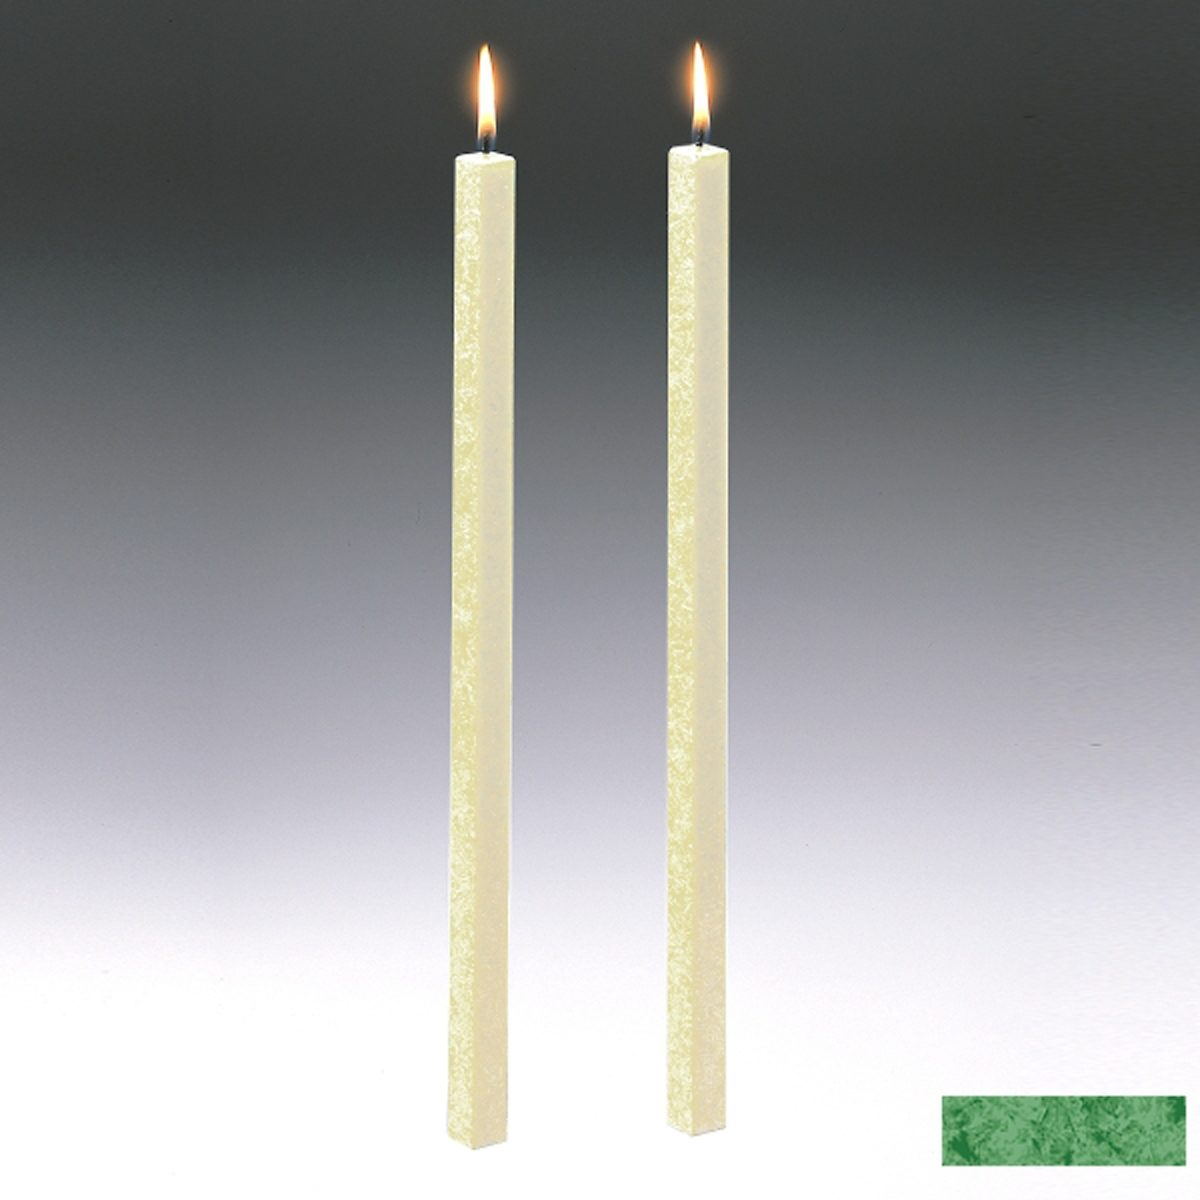 Amabiente Amabiente Kerze CLASSIC Blattgrün 40cm - 2er Set